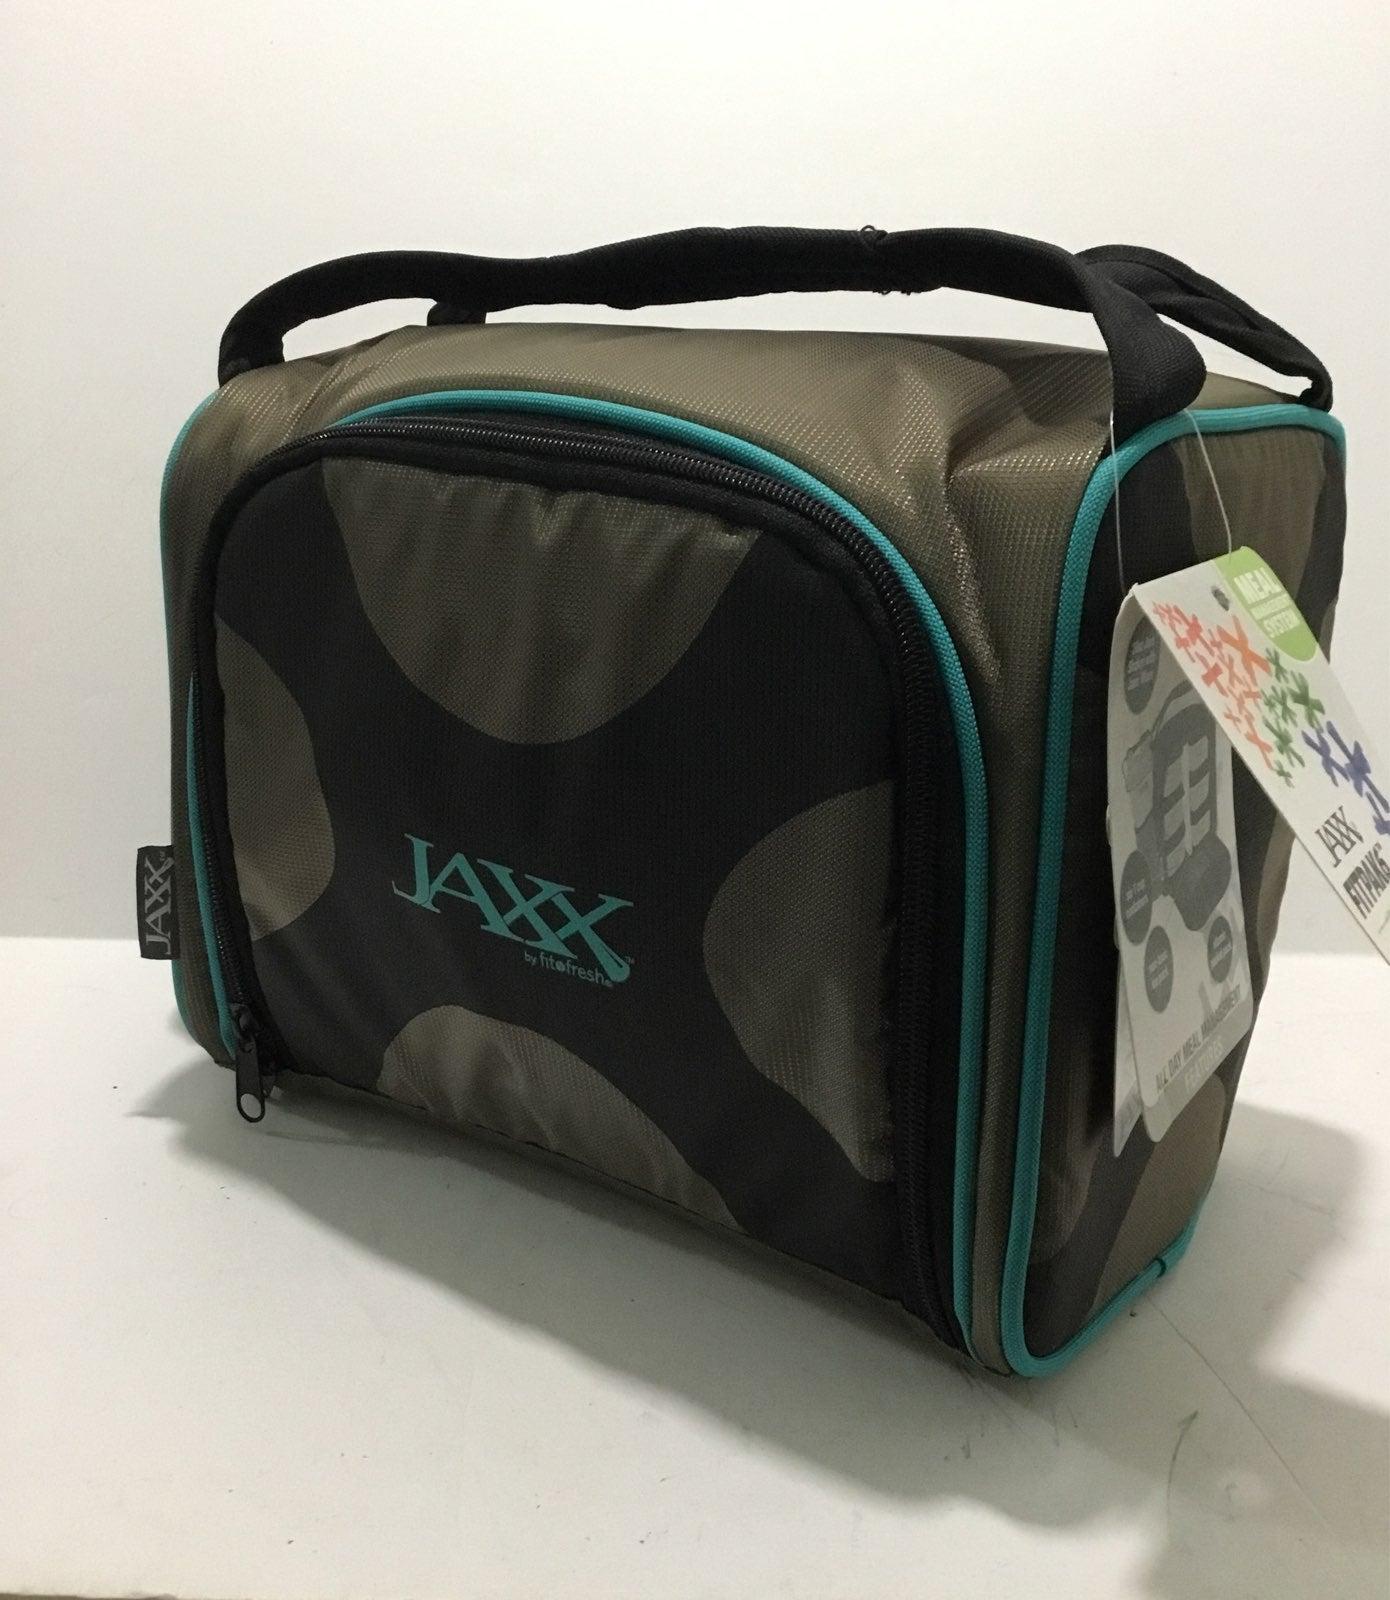 JAXX Meal Prep bag by Fit & Fresh